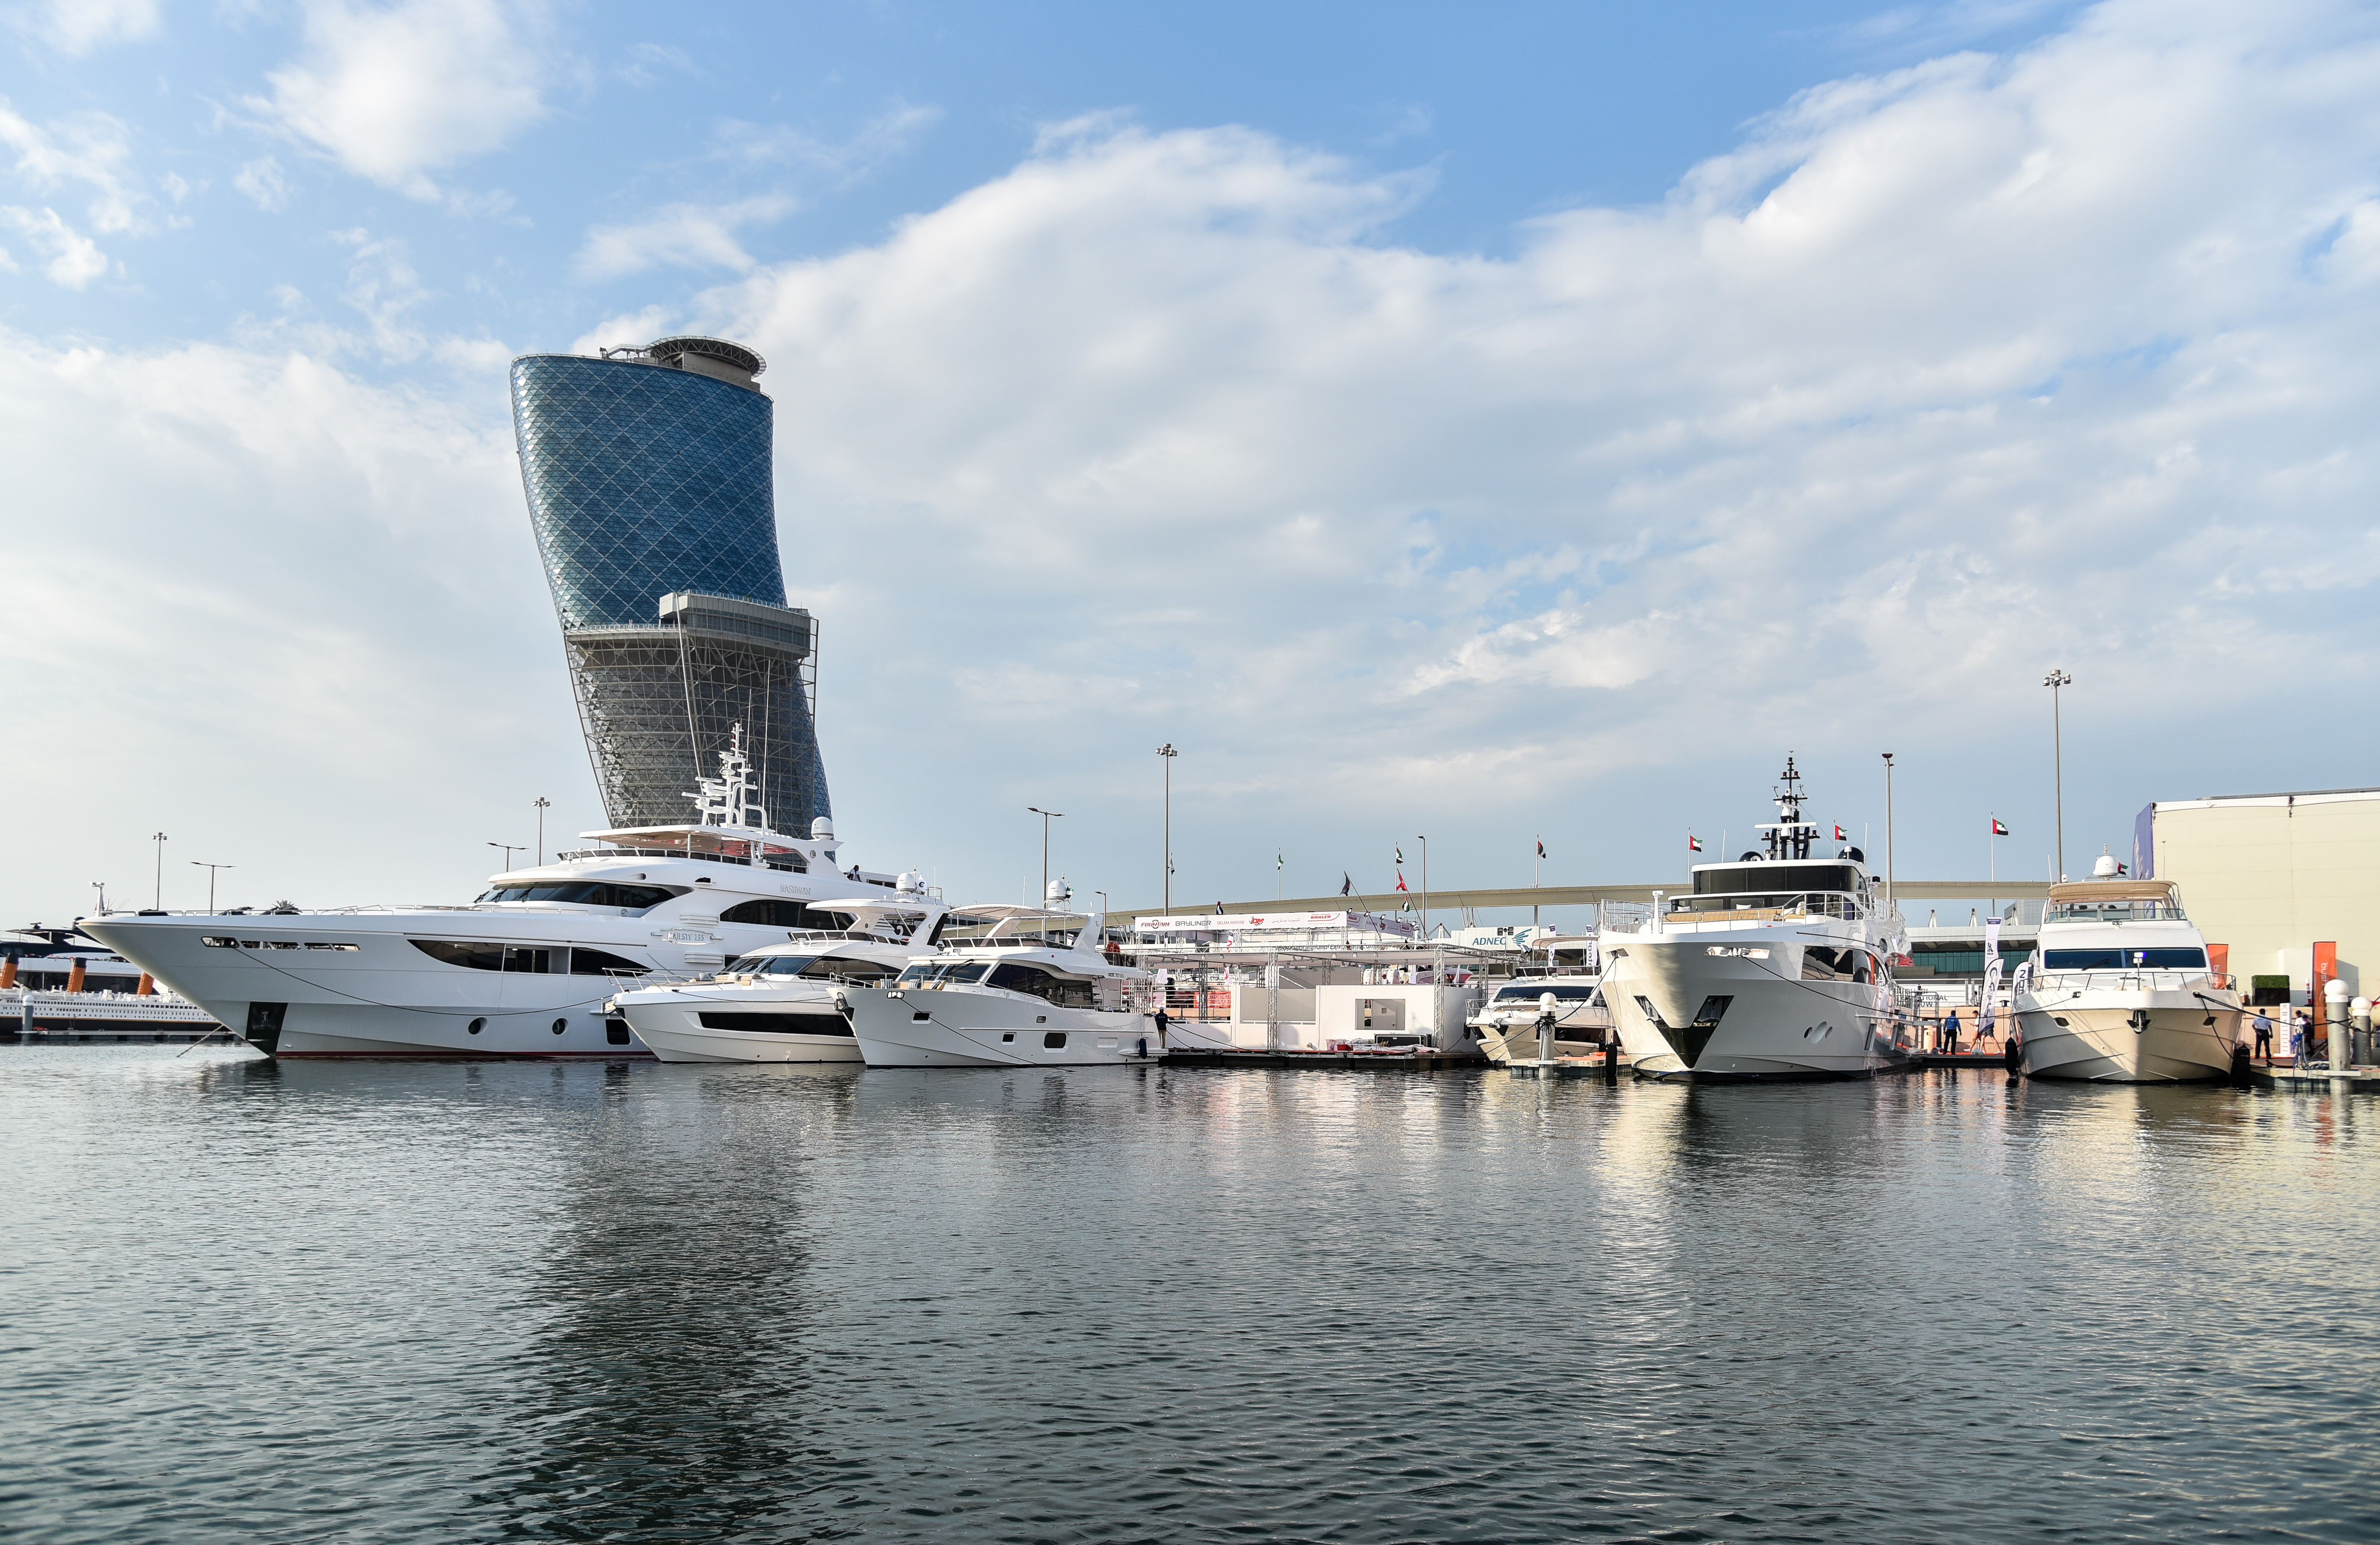 Gulf Craft at Abu Dhabi Boat Show 2018 Day 3 (6).jpg